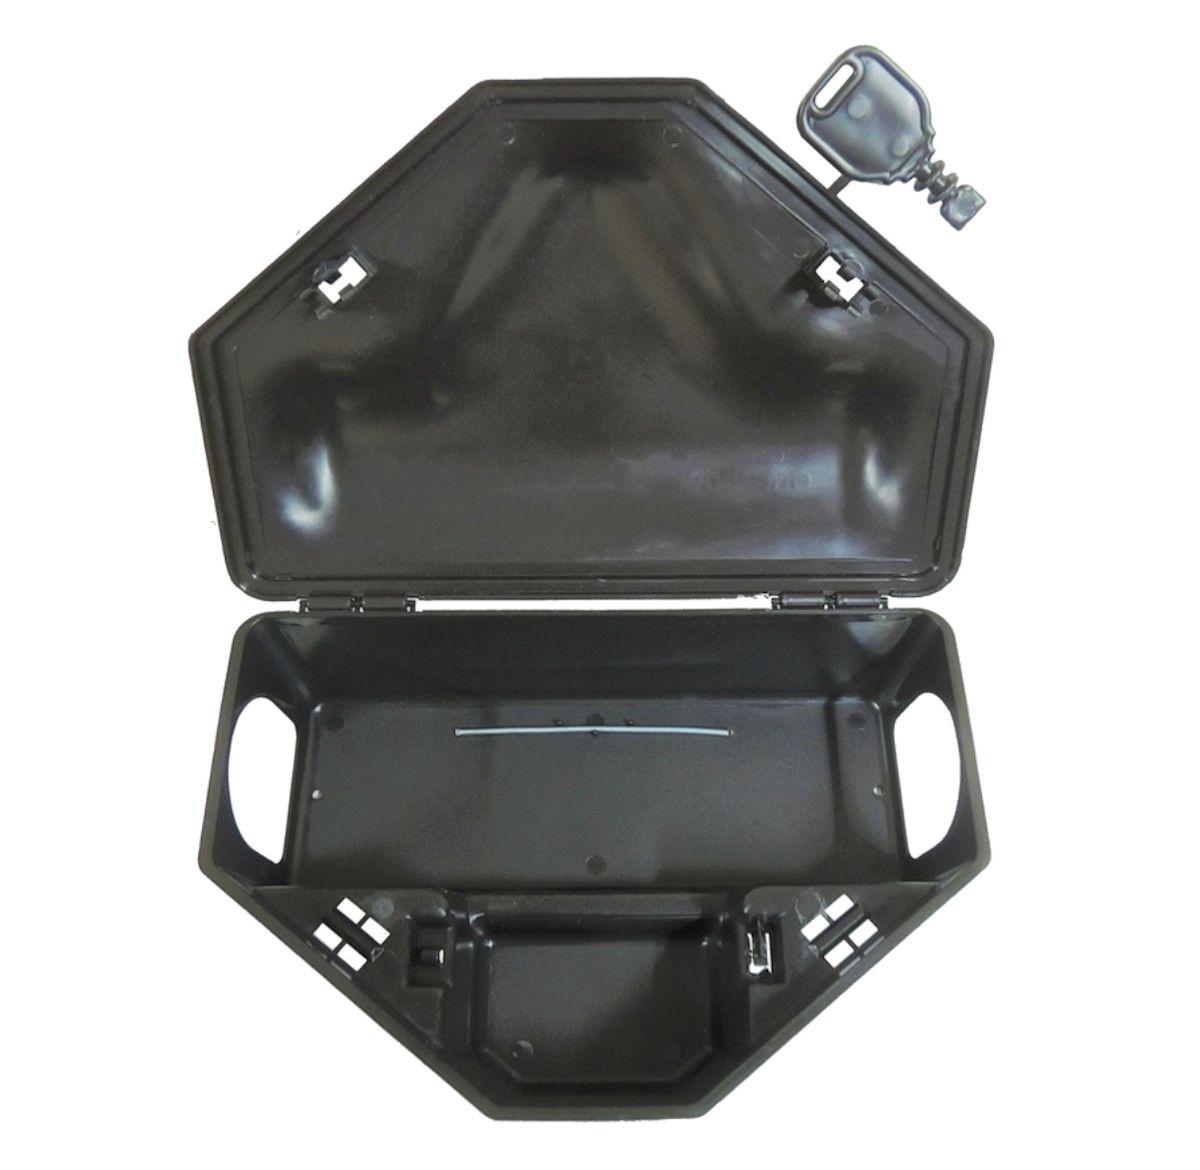 Kit 39 Porta Isca Com 2 Chaves - Duplo Travamento